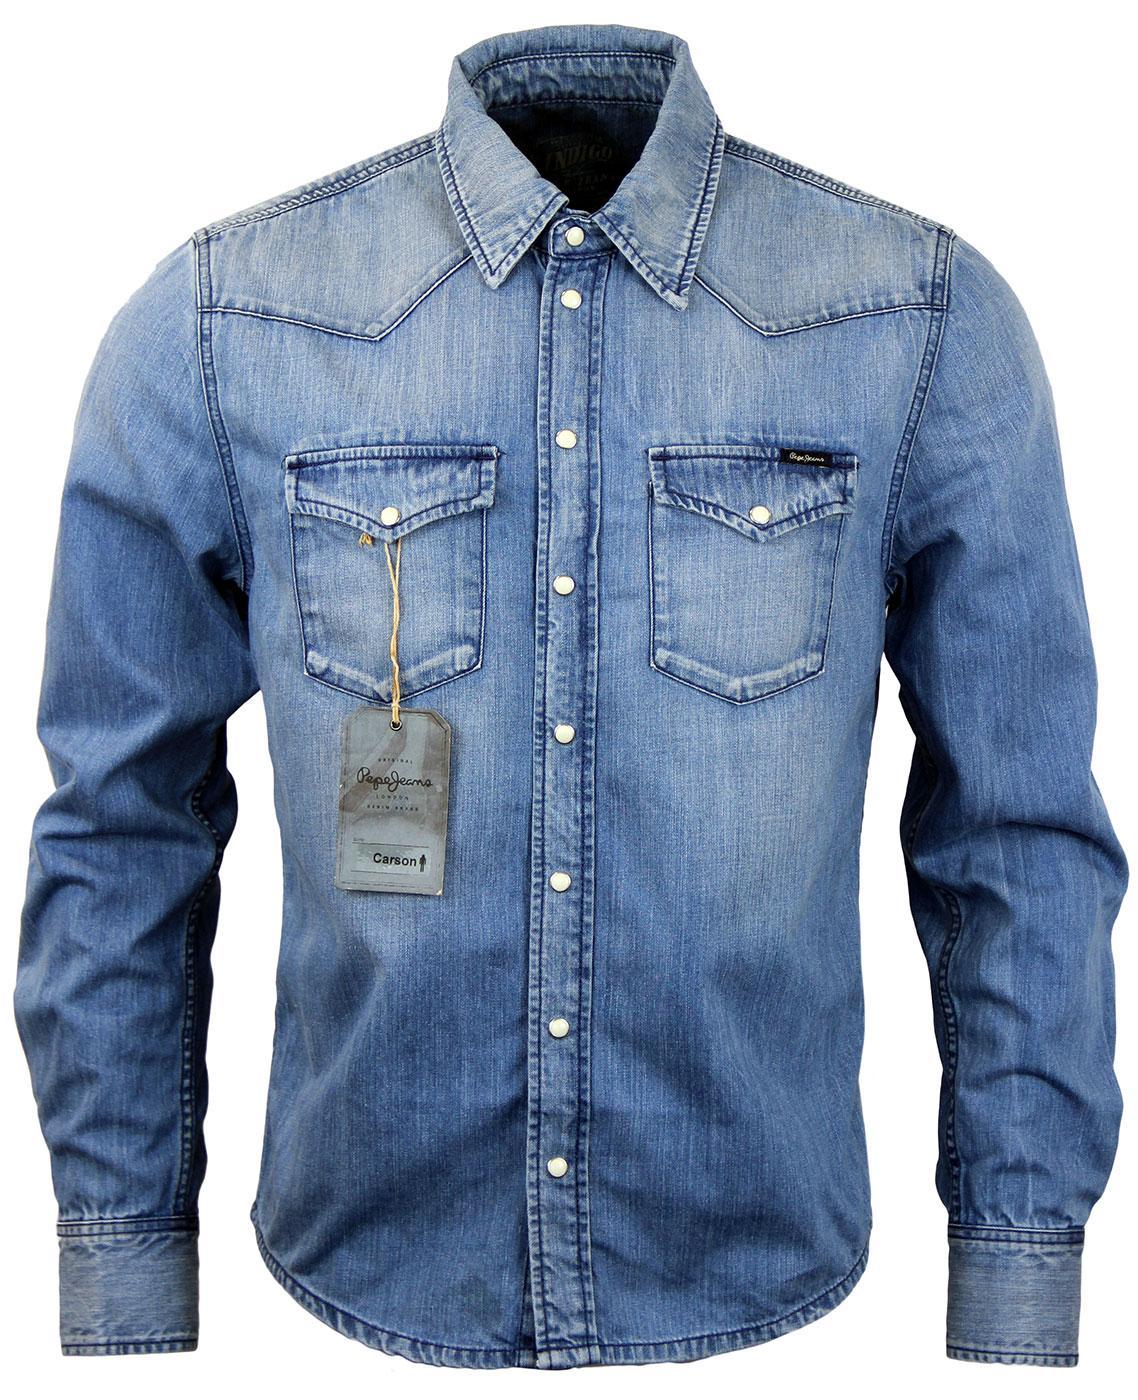 Denim Jeans Shirt For Men - Jeans Am